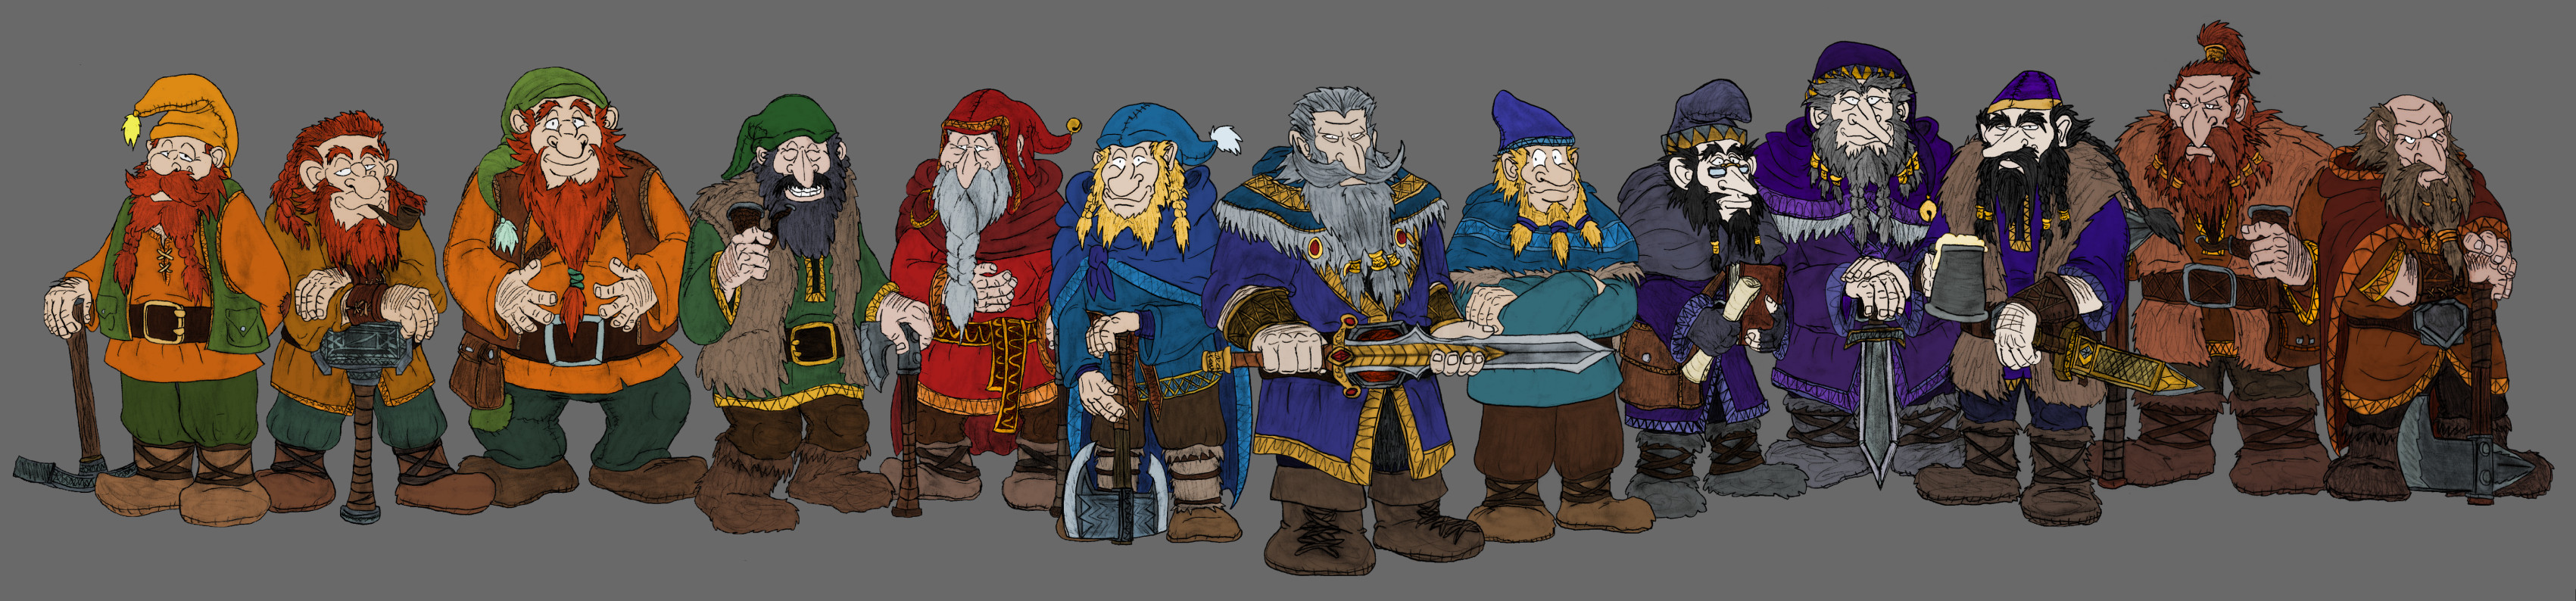 Thorin and Company by Mara999